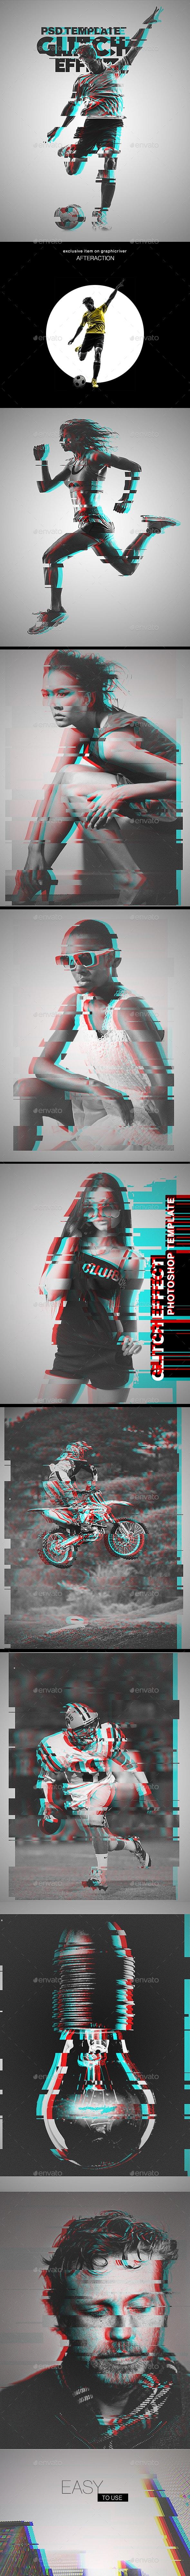 Glitch Effect Photoshop Template - Artistic Photo Templates